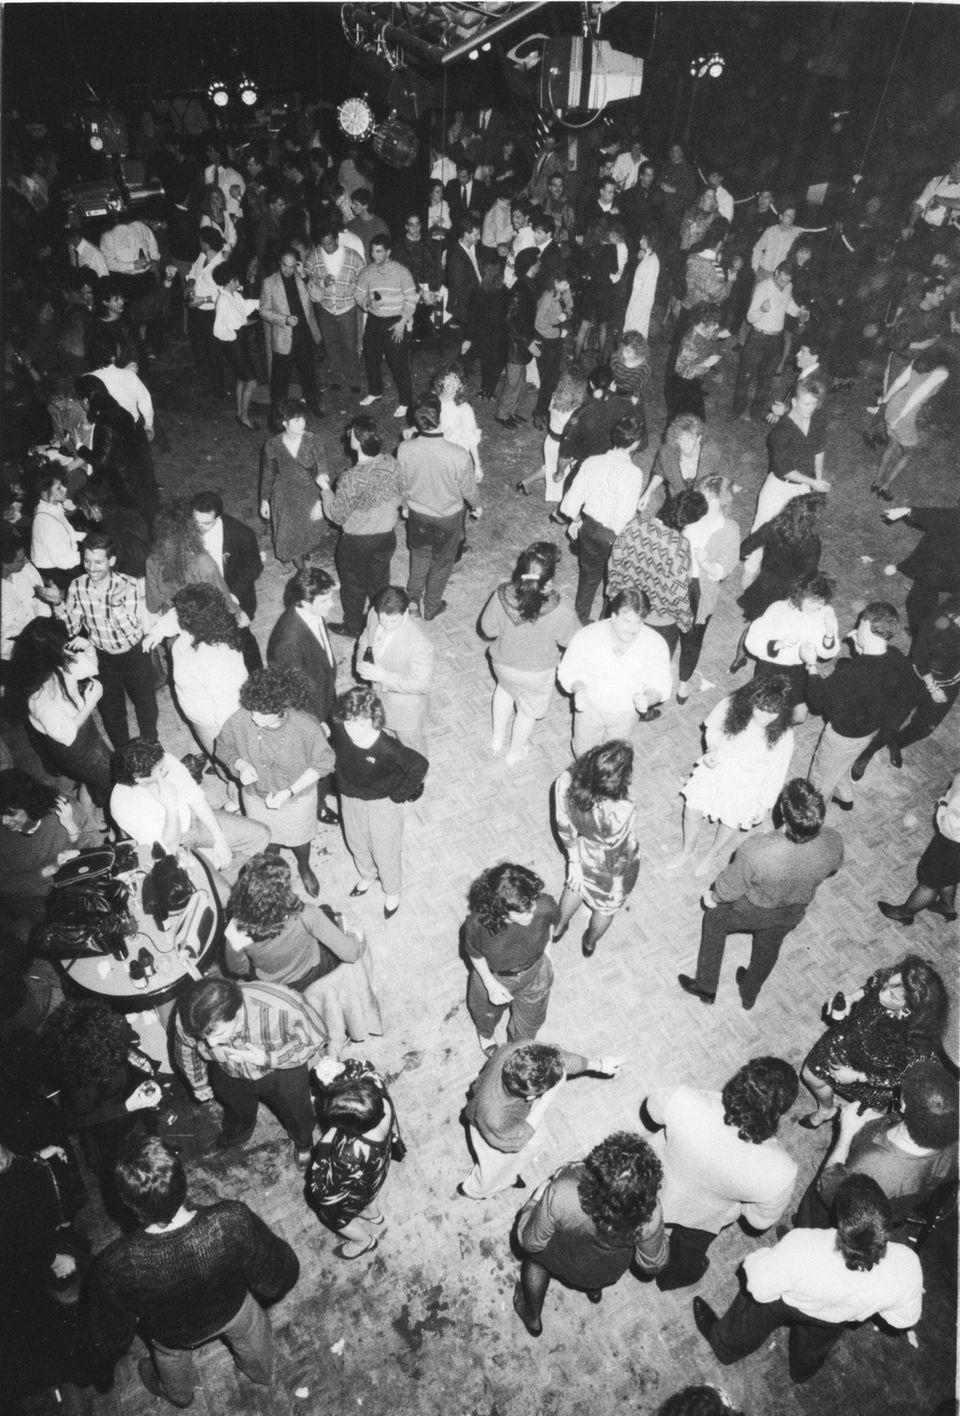 Dancers gather on the floor at LI Exchange